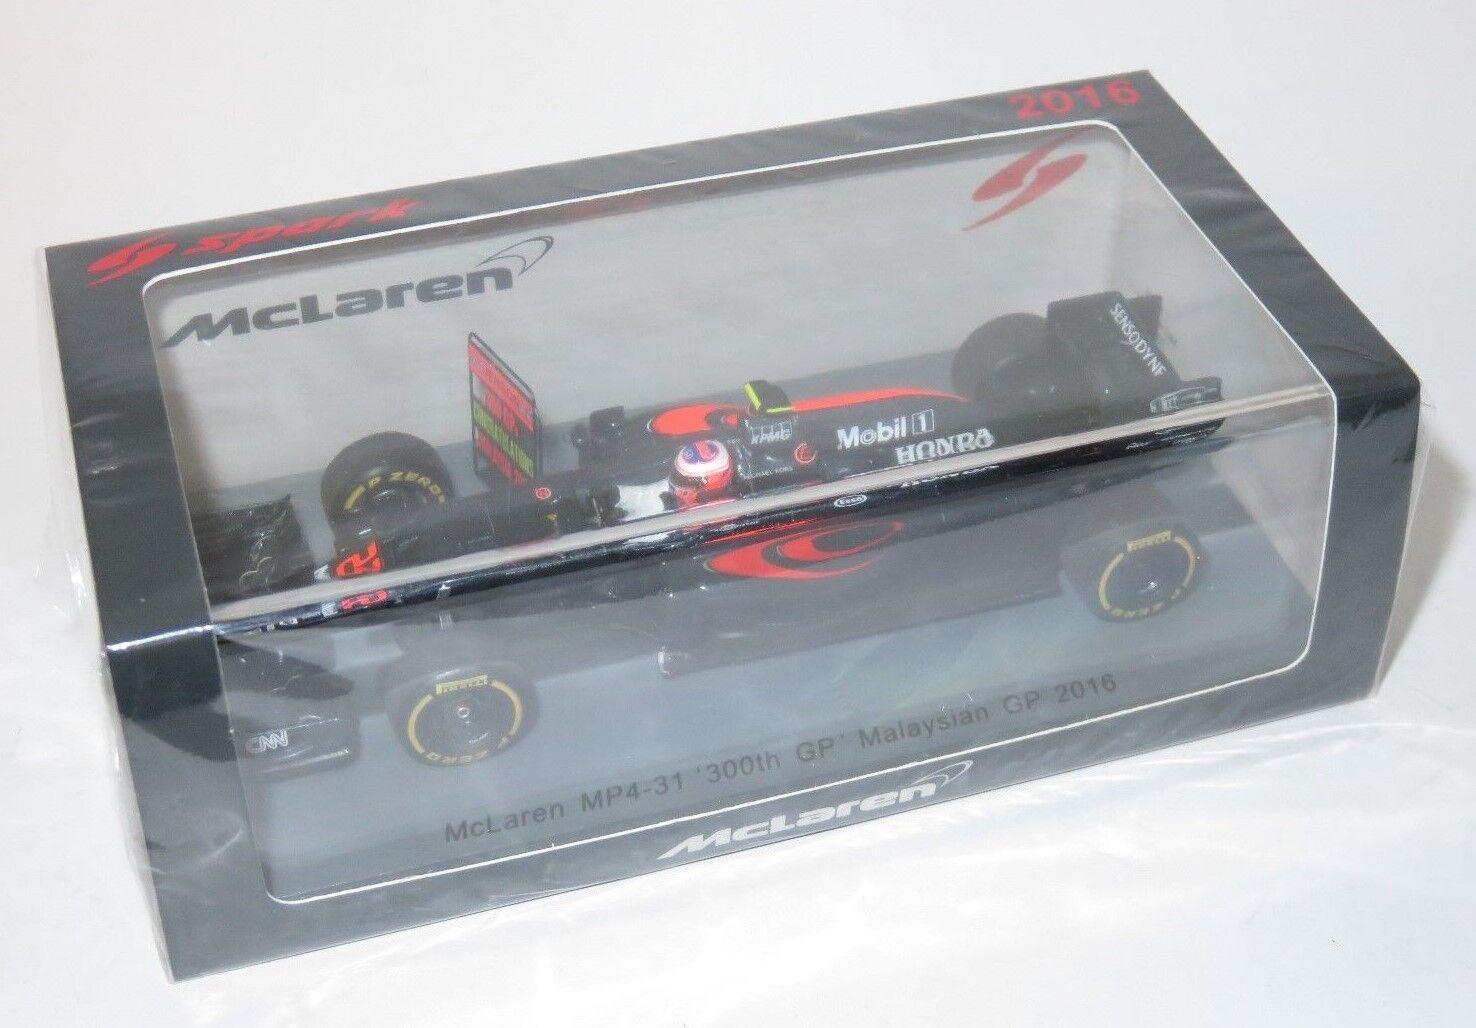 sorteos de estadio 1 1 1 43 McLaren MP4-31 Honda 300th Gp Malasia 2016 Jenson Button con PIT Board  promociones